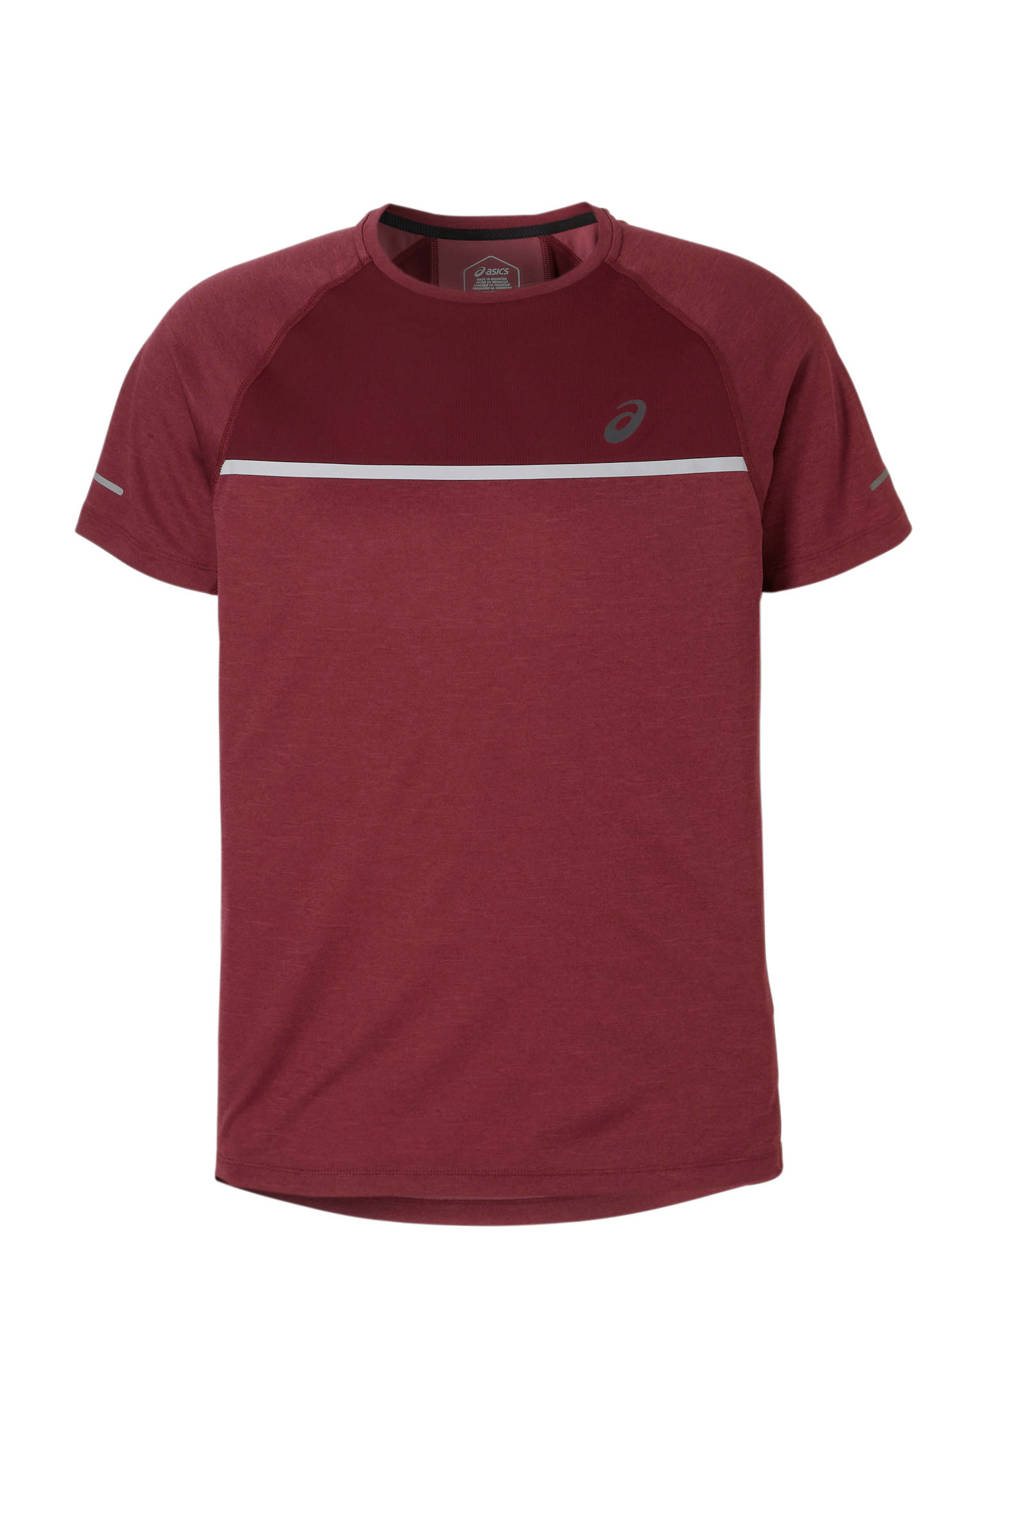 ASICS   hardloop T-shirt, Donkerrood